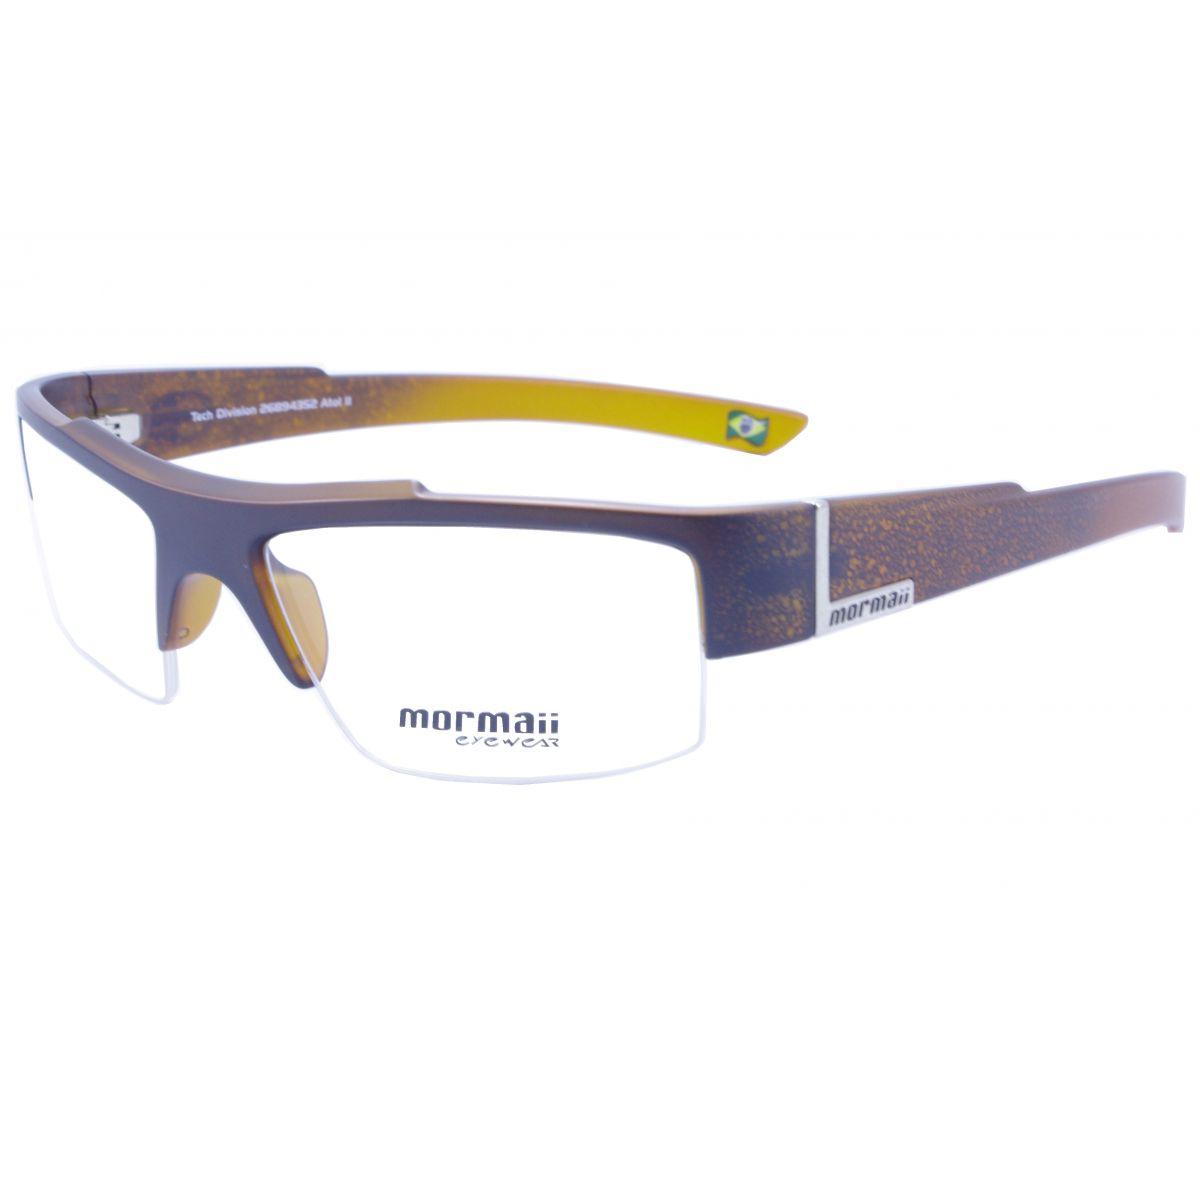 e4c5b51a2c410 Óculos De Grau Mormaii Atol 2 1268 943 Tam.52MormaiiMormaii de ...